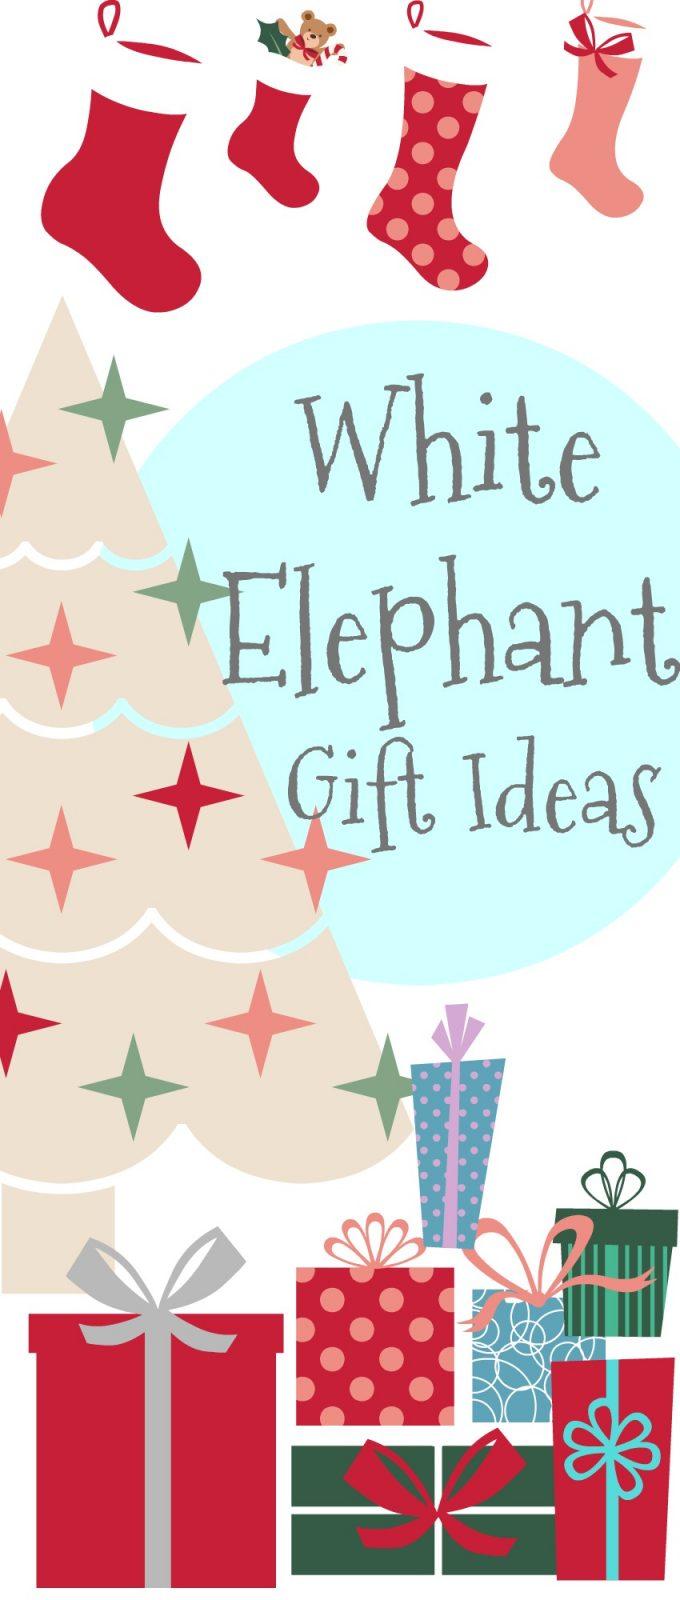 white elephant gift ideas